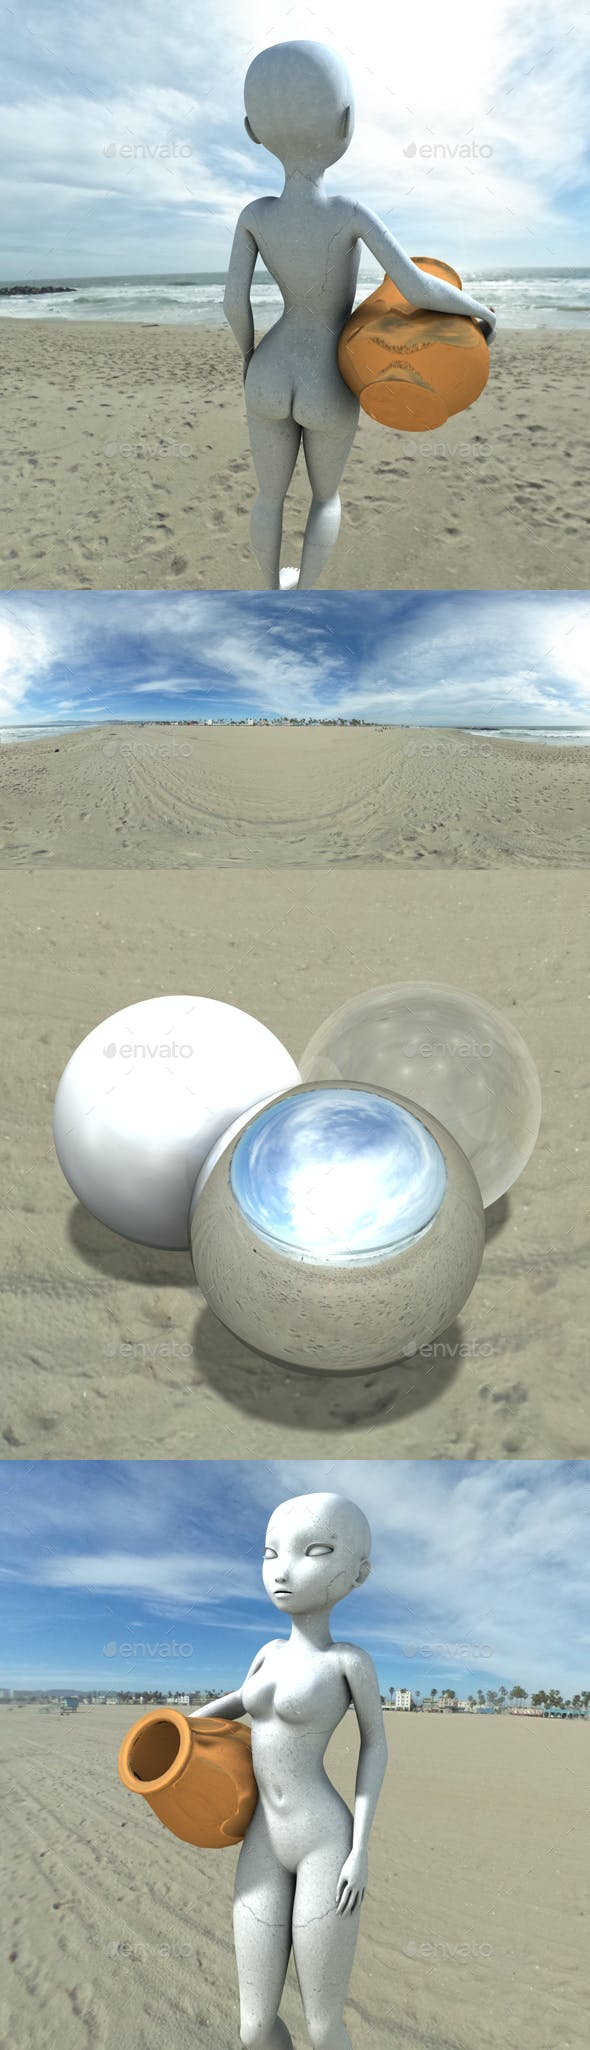 Bright Venice Beach HDRI - 3DOcean Item for Sale